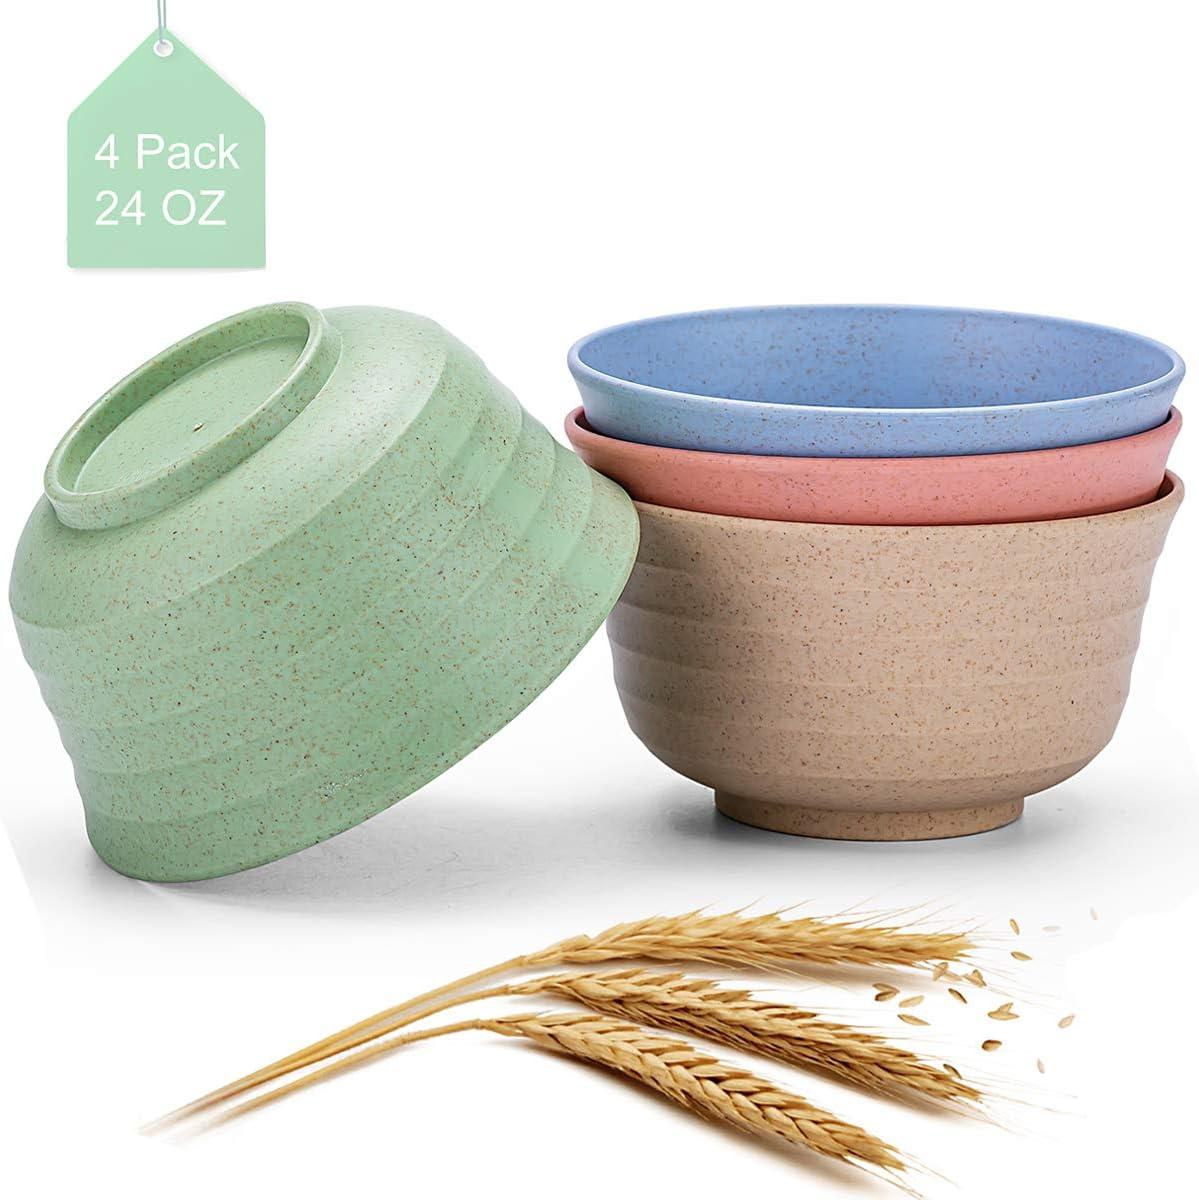 Bligo Unbreakable Cereal Bowls, Lightweight Wheat Straw Fiber Bowl for Children Rice Noodle Soup Snack, Dishwasher & Microwave Safe, 24 OZ, 4 Pack